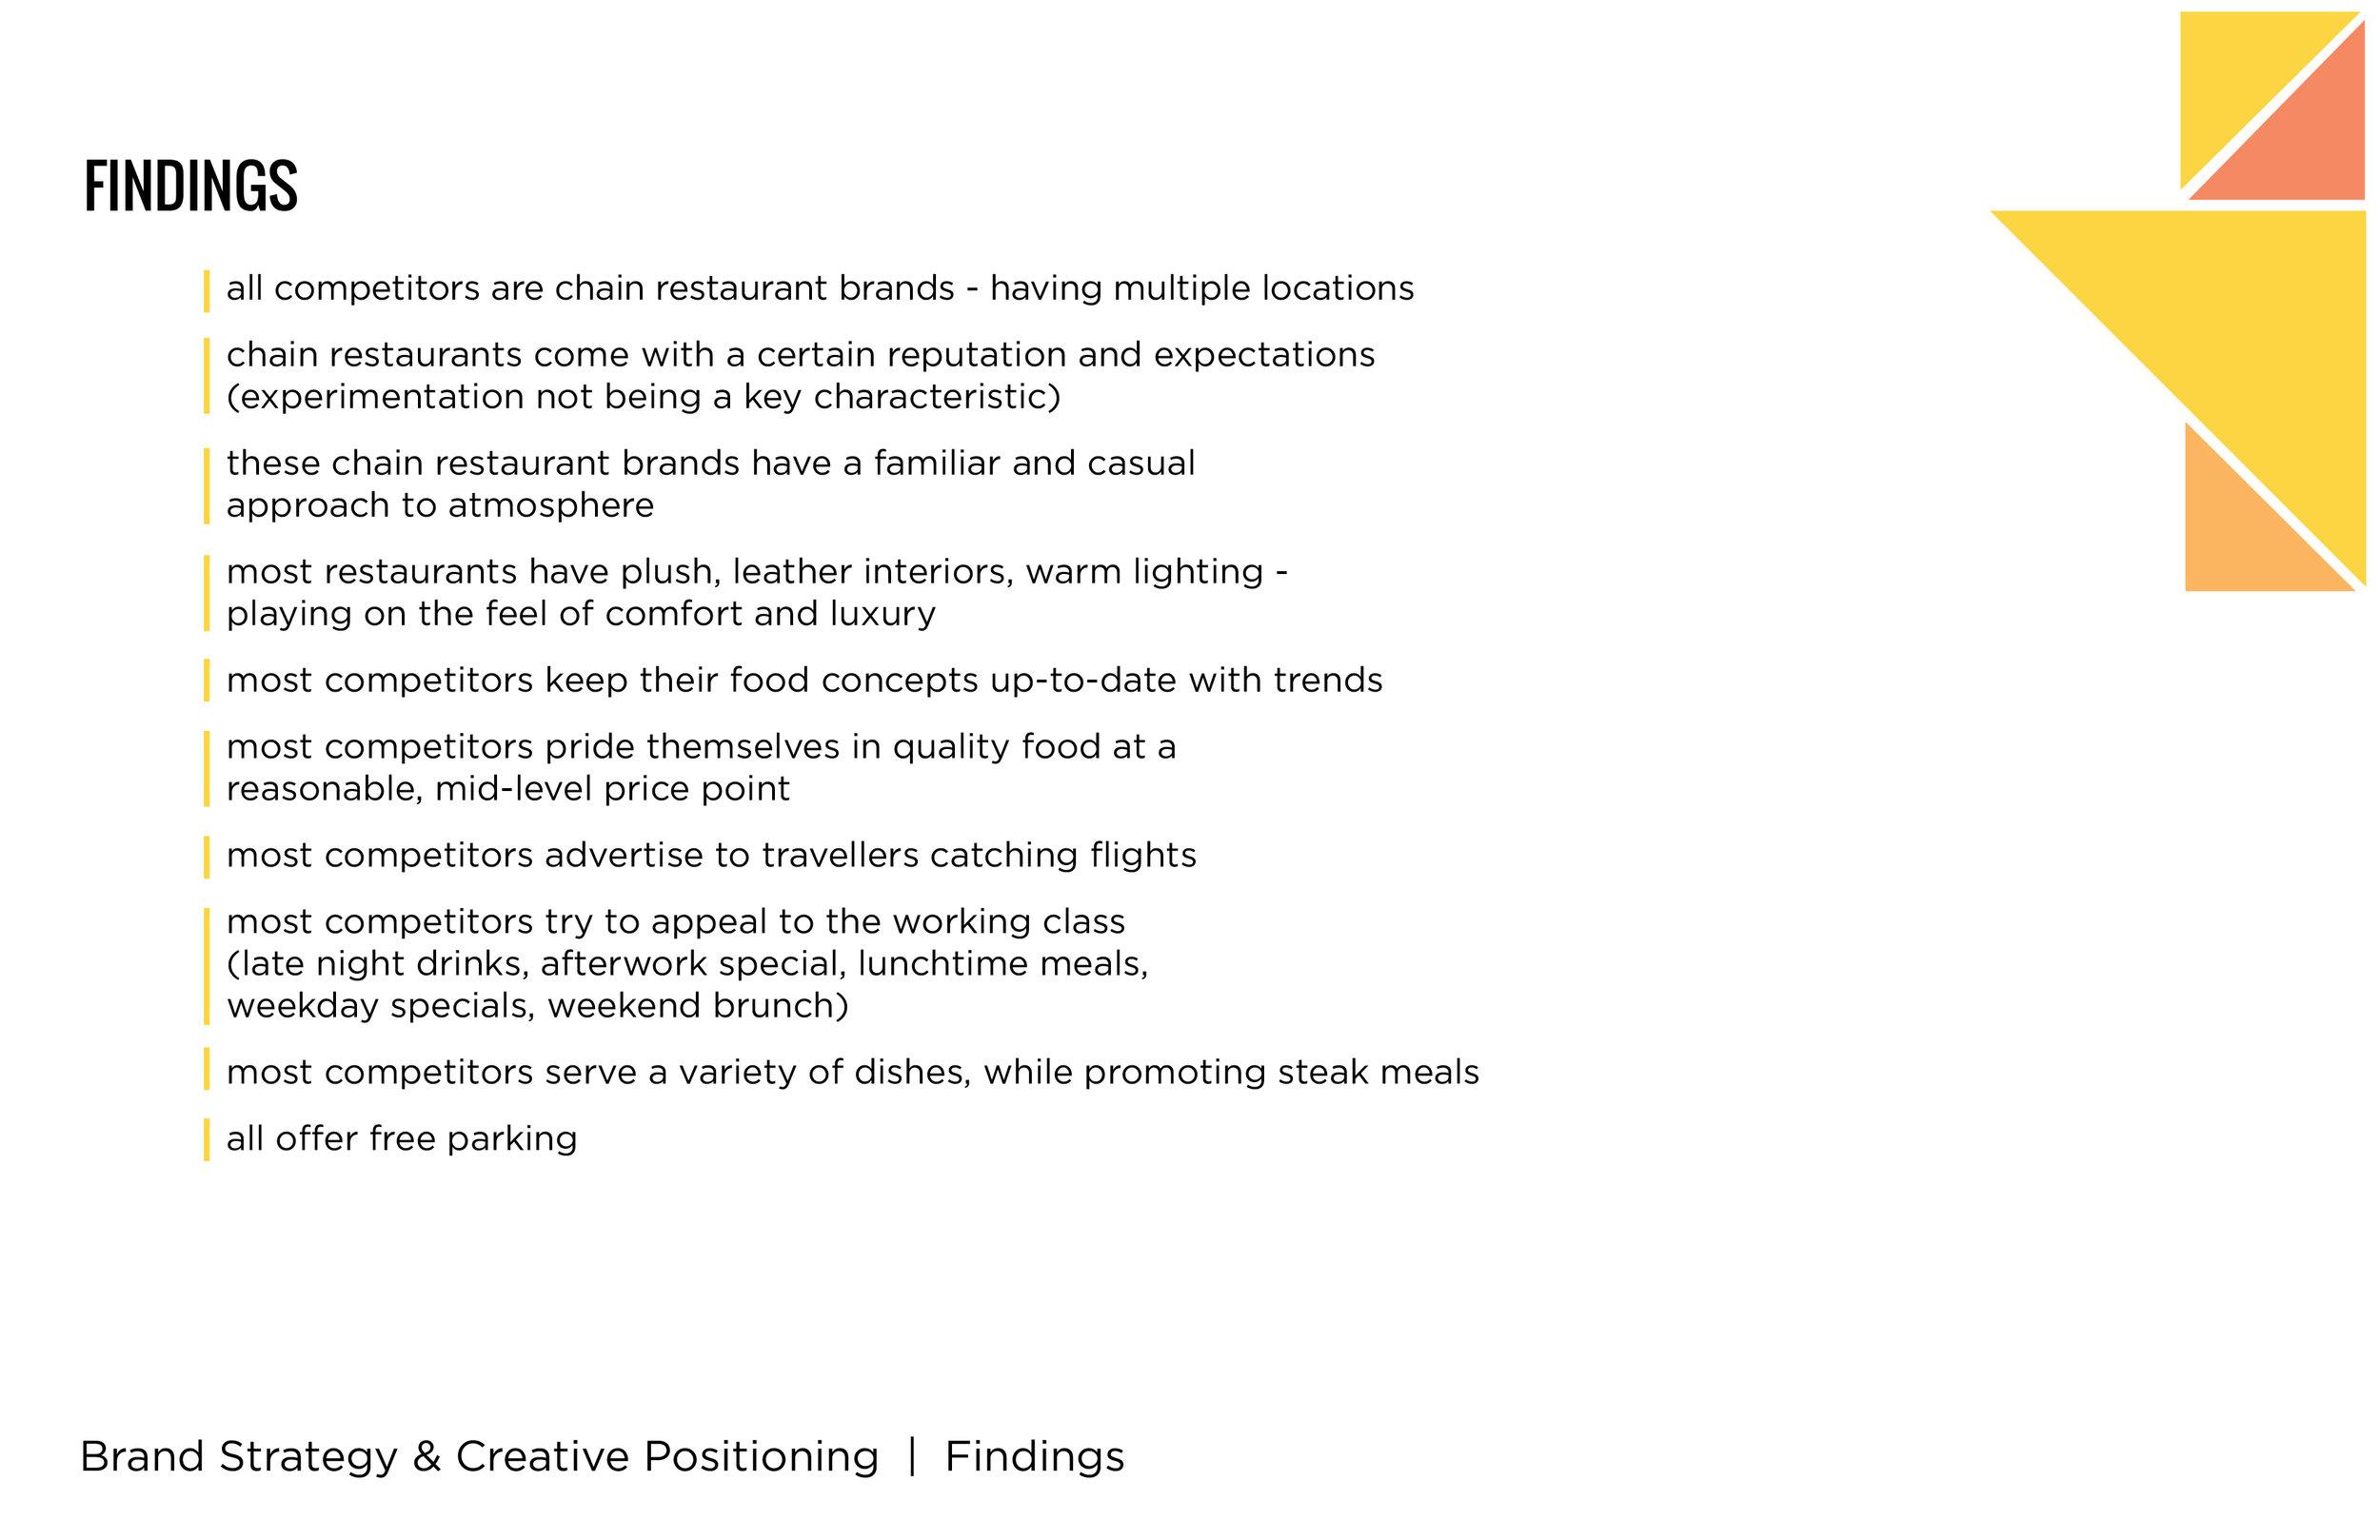 16-008 IPH_LobbyBarIdentity_BrandStratCreativePositioning_July6-9.jpg